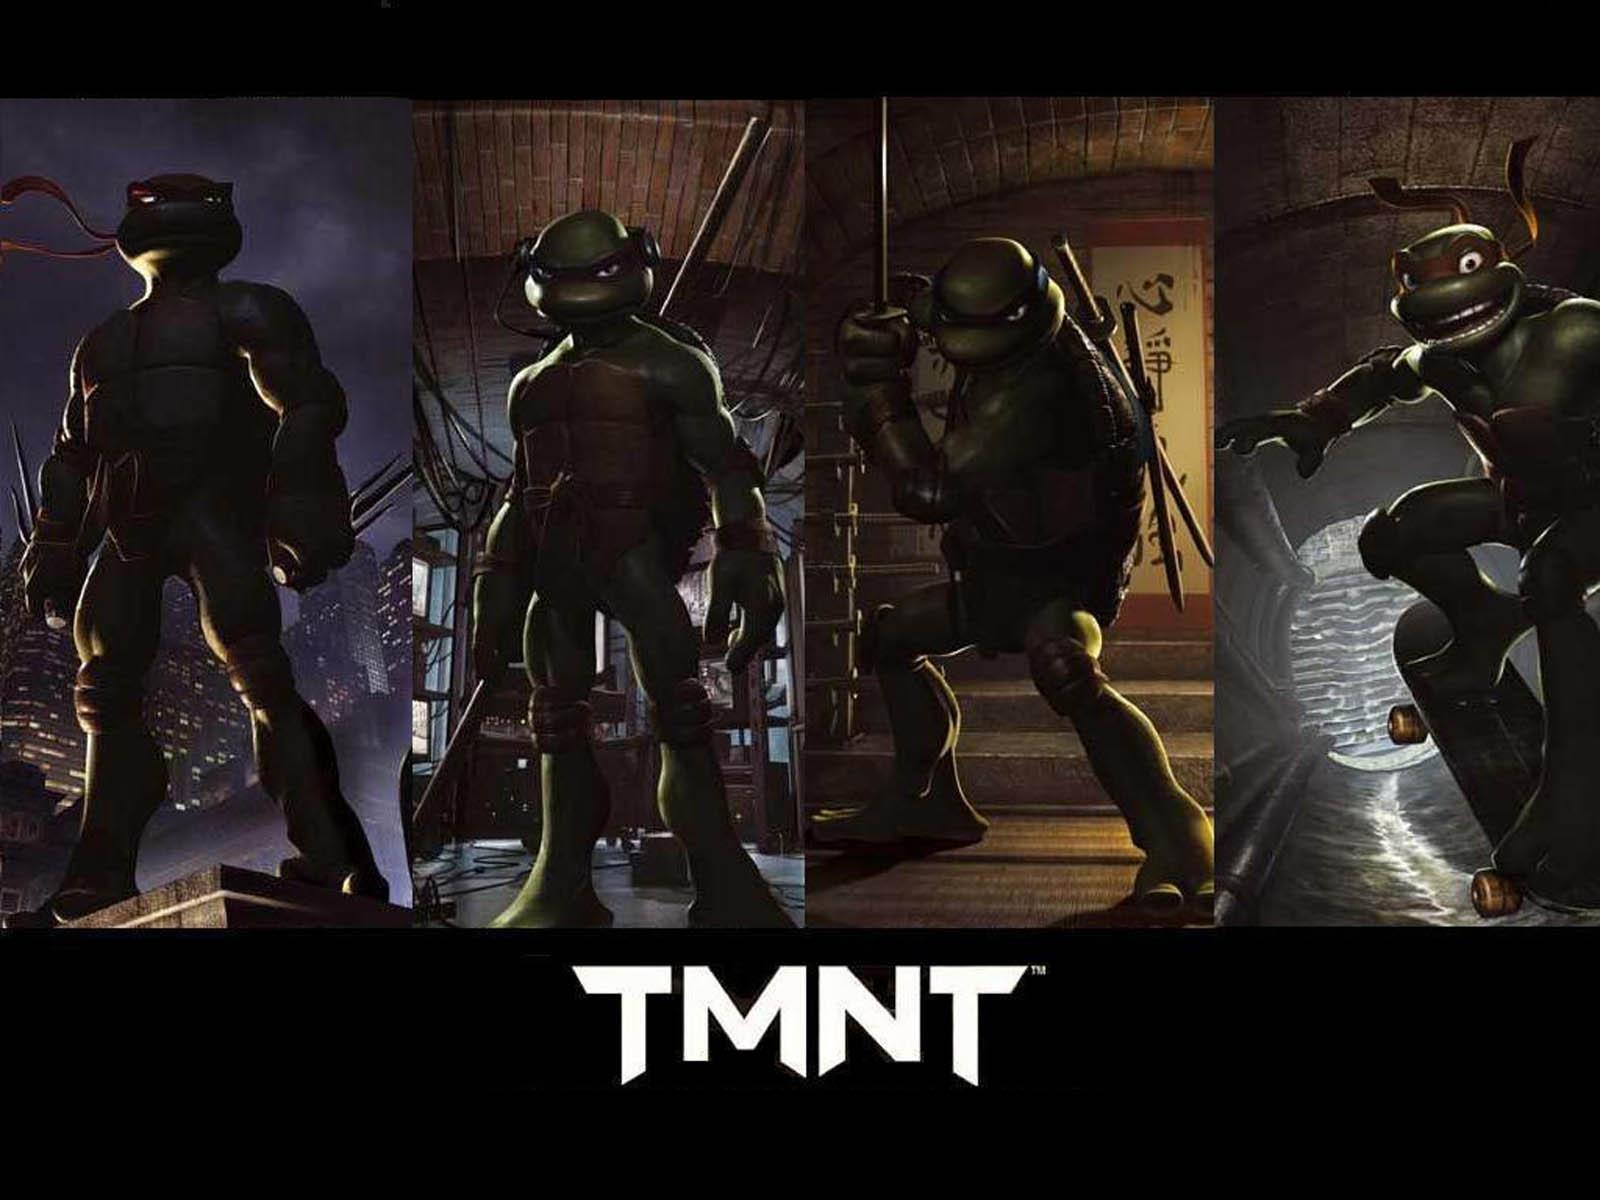 Teenage mutant ninja turtle coupons